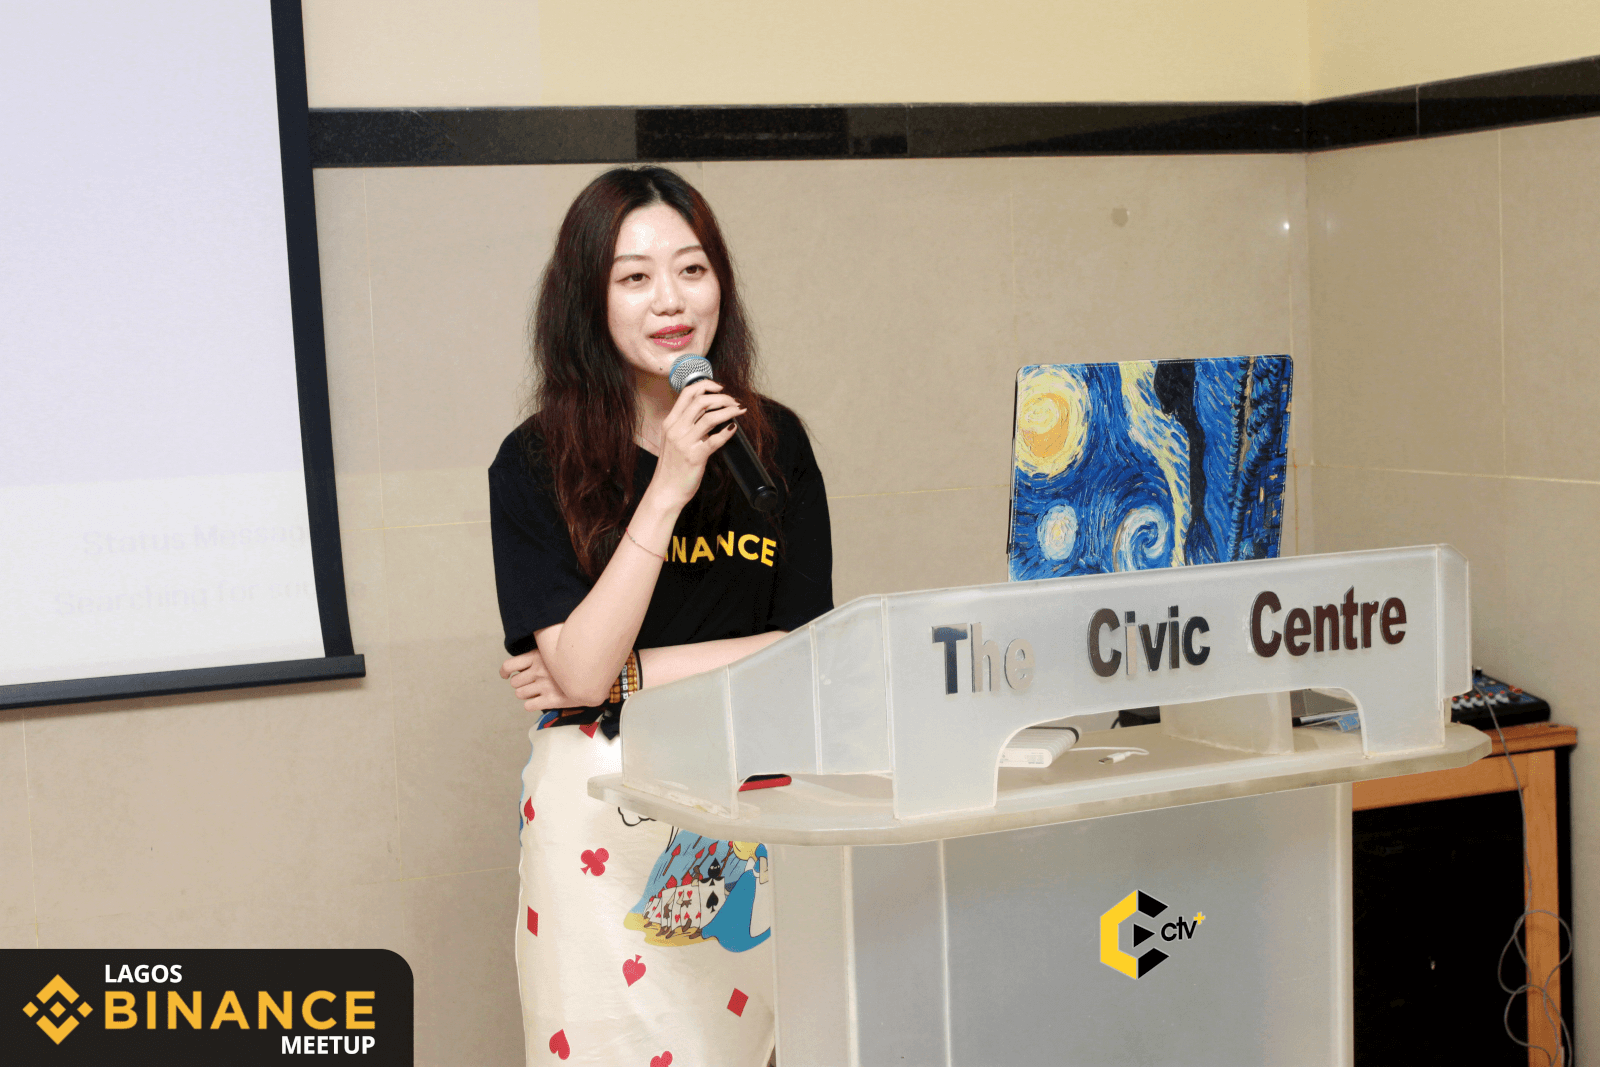 Lagos Binance Meetup: Exposing The Community To The Binance Ecosystem